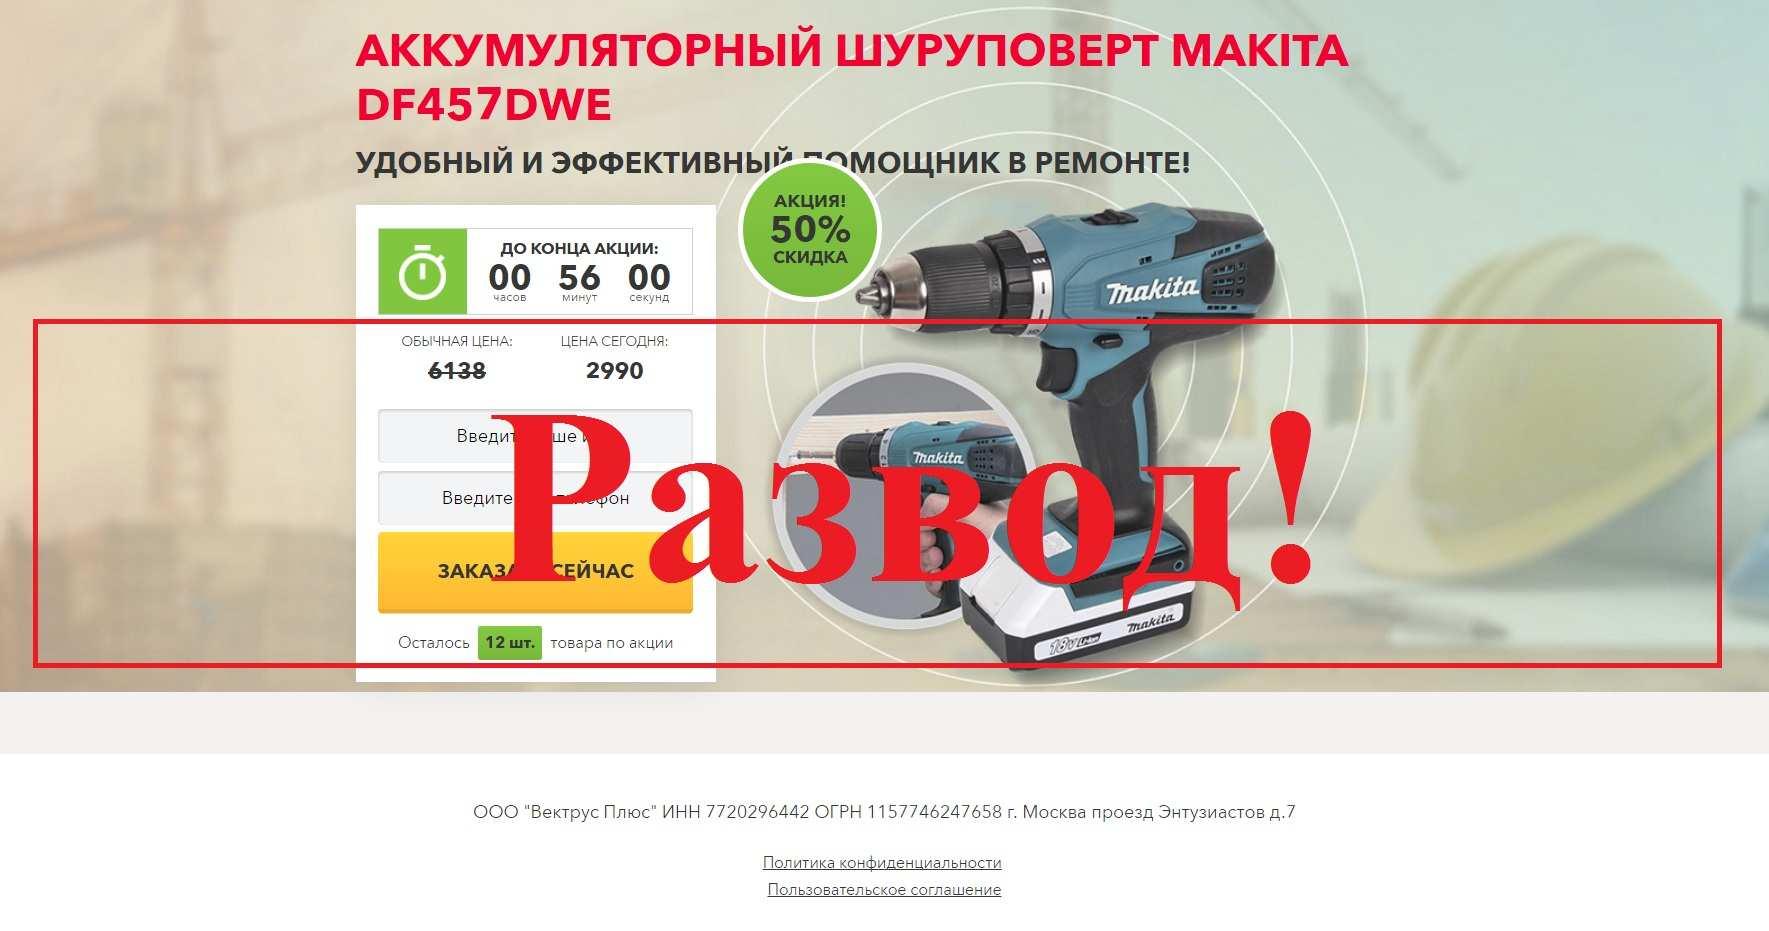 Шуруповерт MAKITA DF457DWE – отзывы о подделке